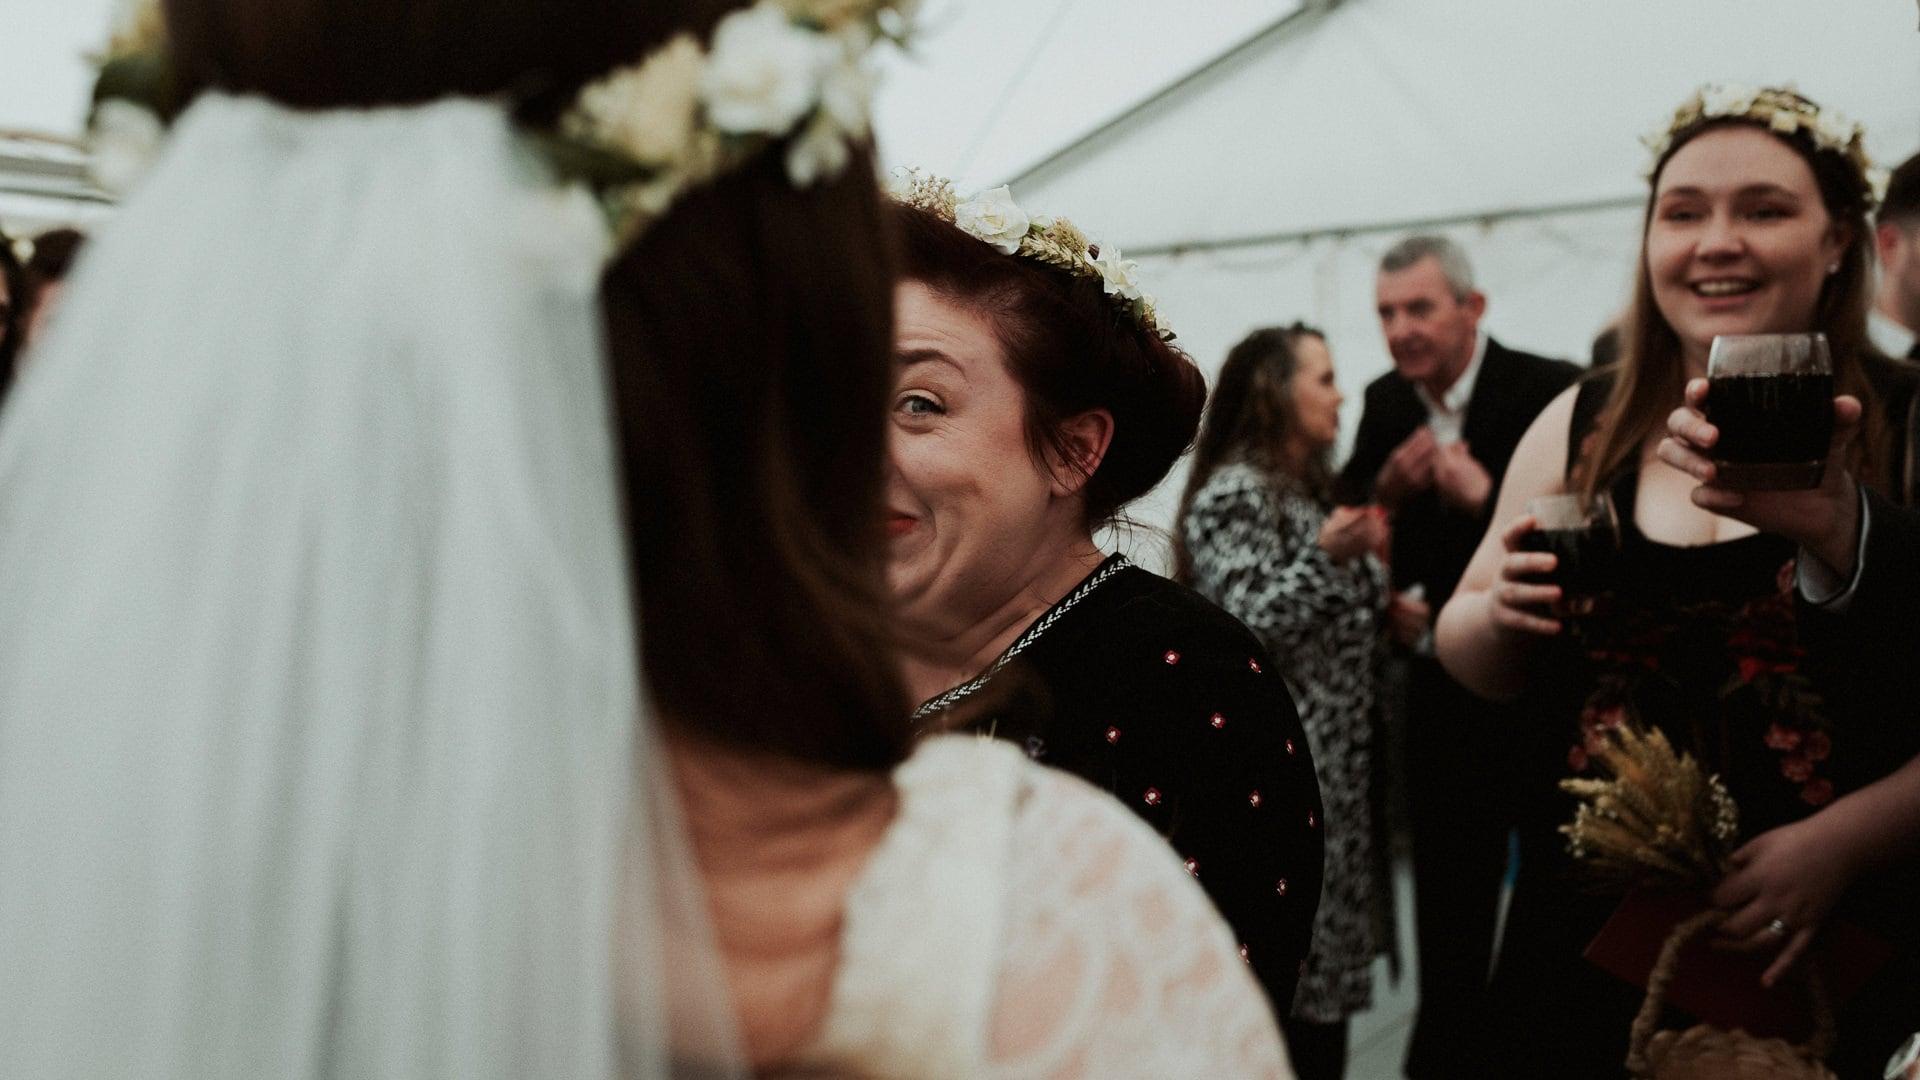 Edenbarn Wedding Photographer Lake District England 0039